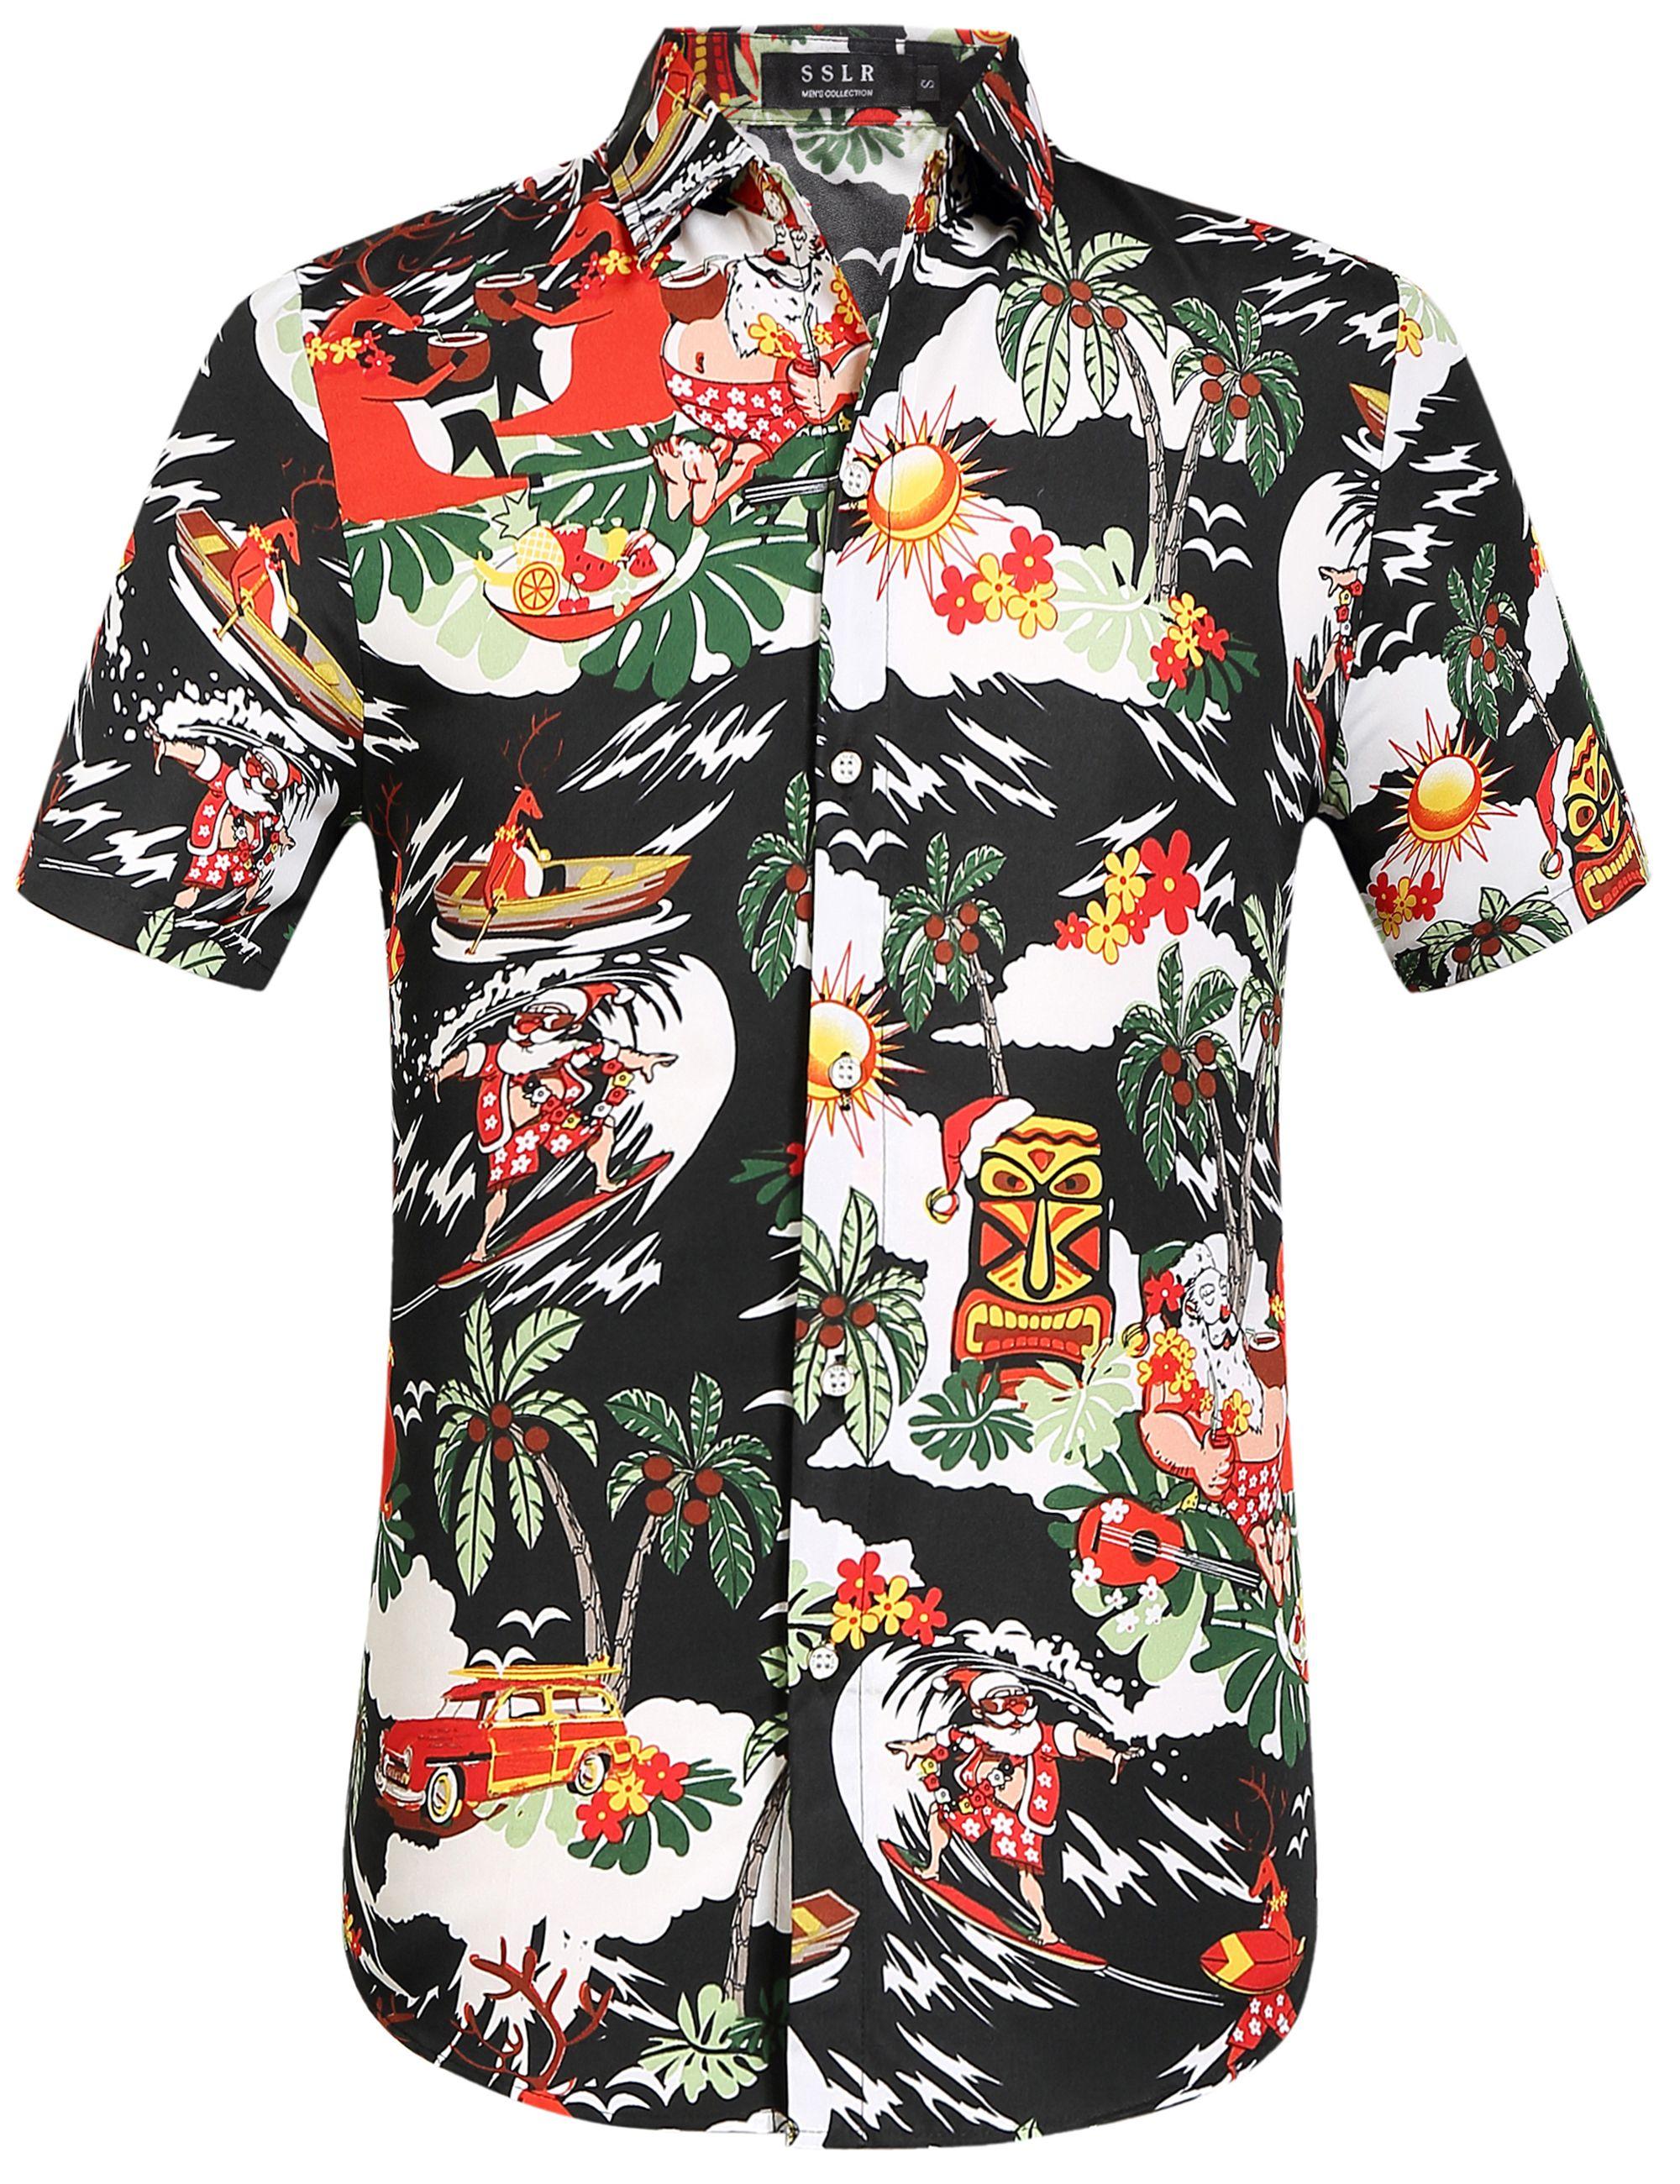 ee3a2983 SSLR Black Men's Christmas Santa Claus Party Casual Tropical Hawaiian Shirt